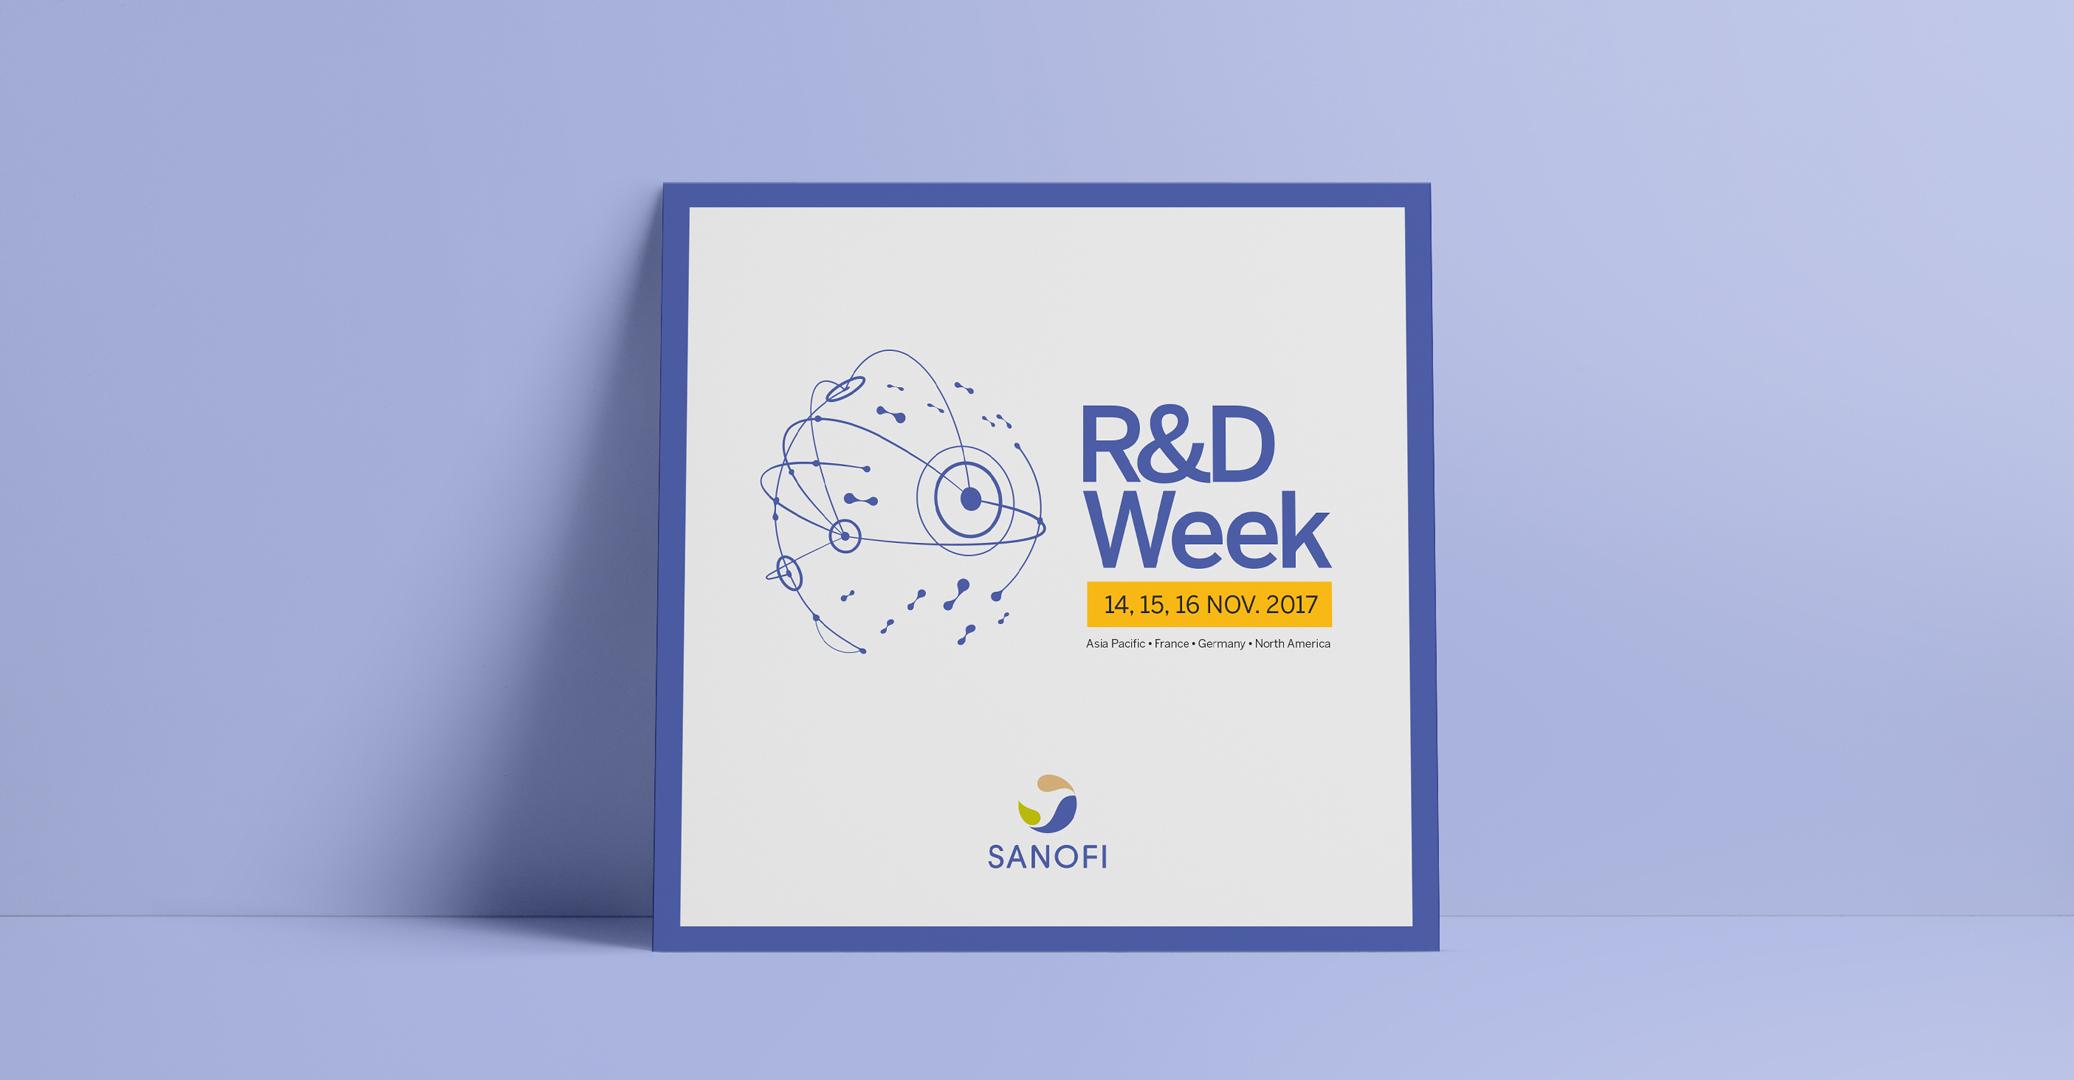 sanofi-r&d-week